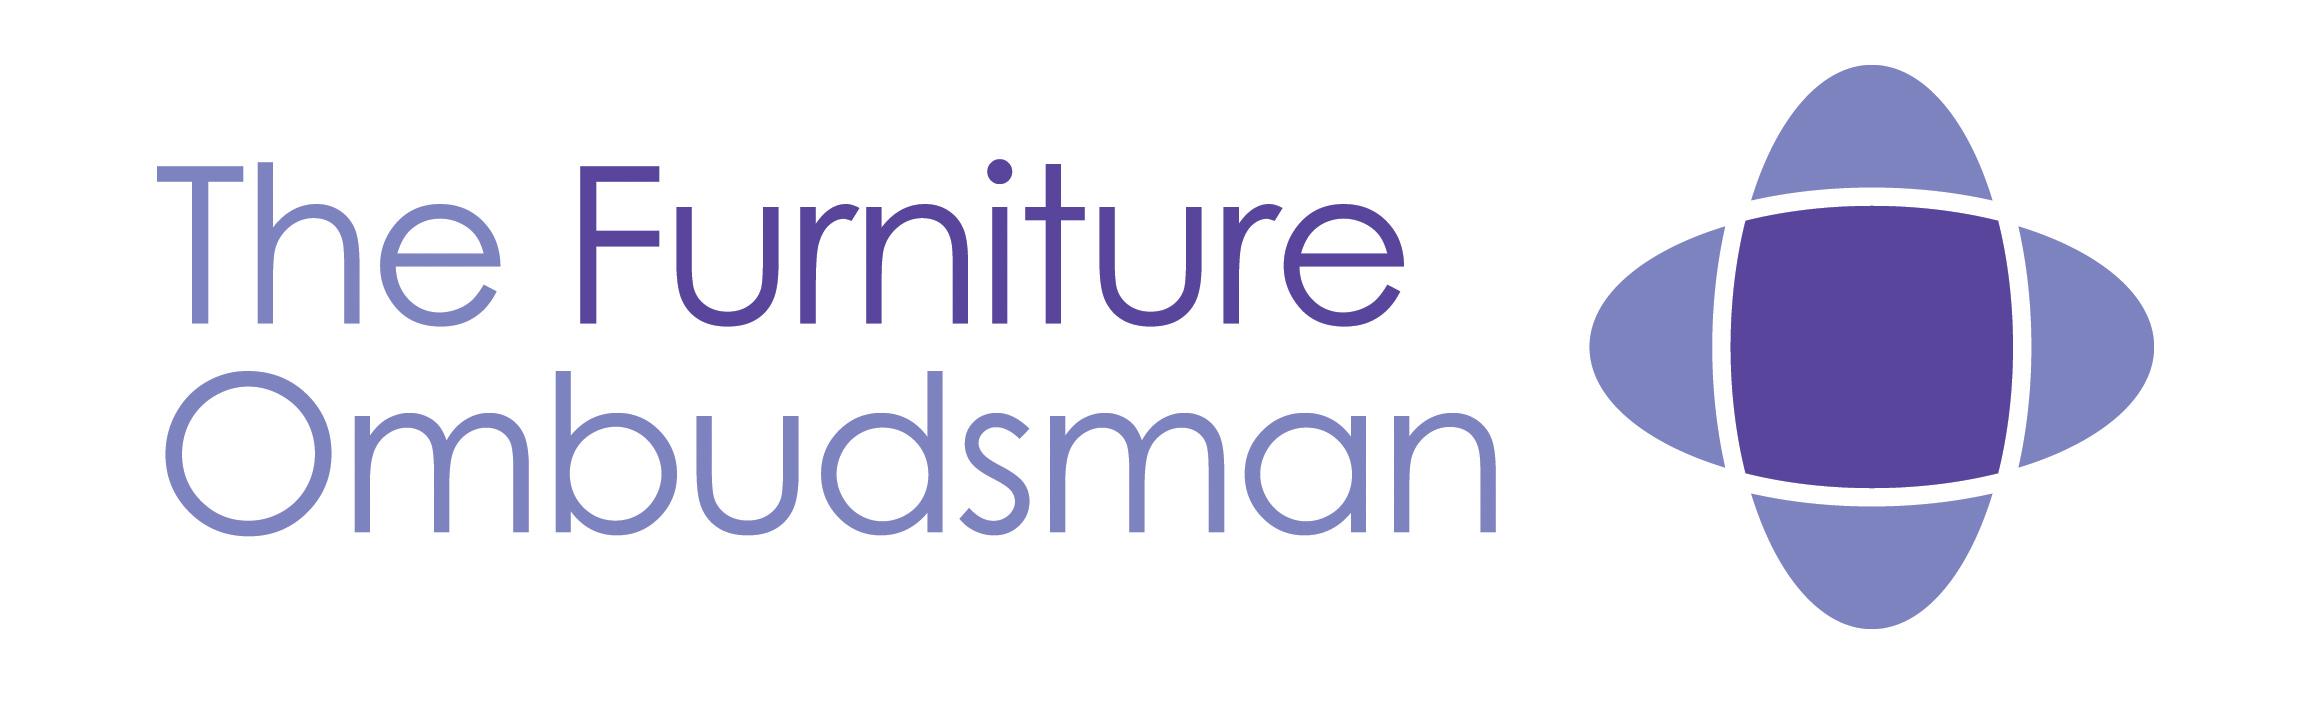 The Furniture Ombudsman